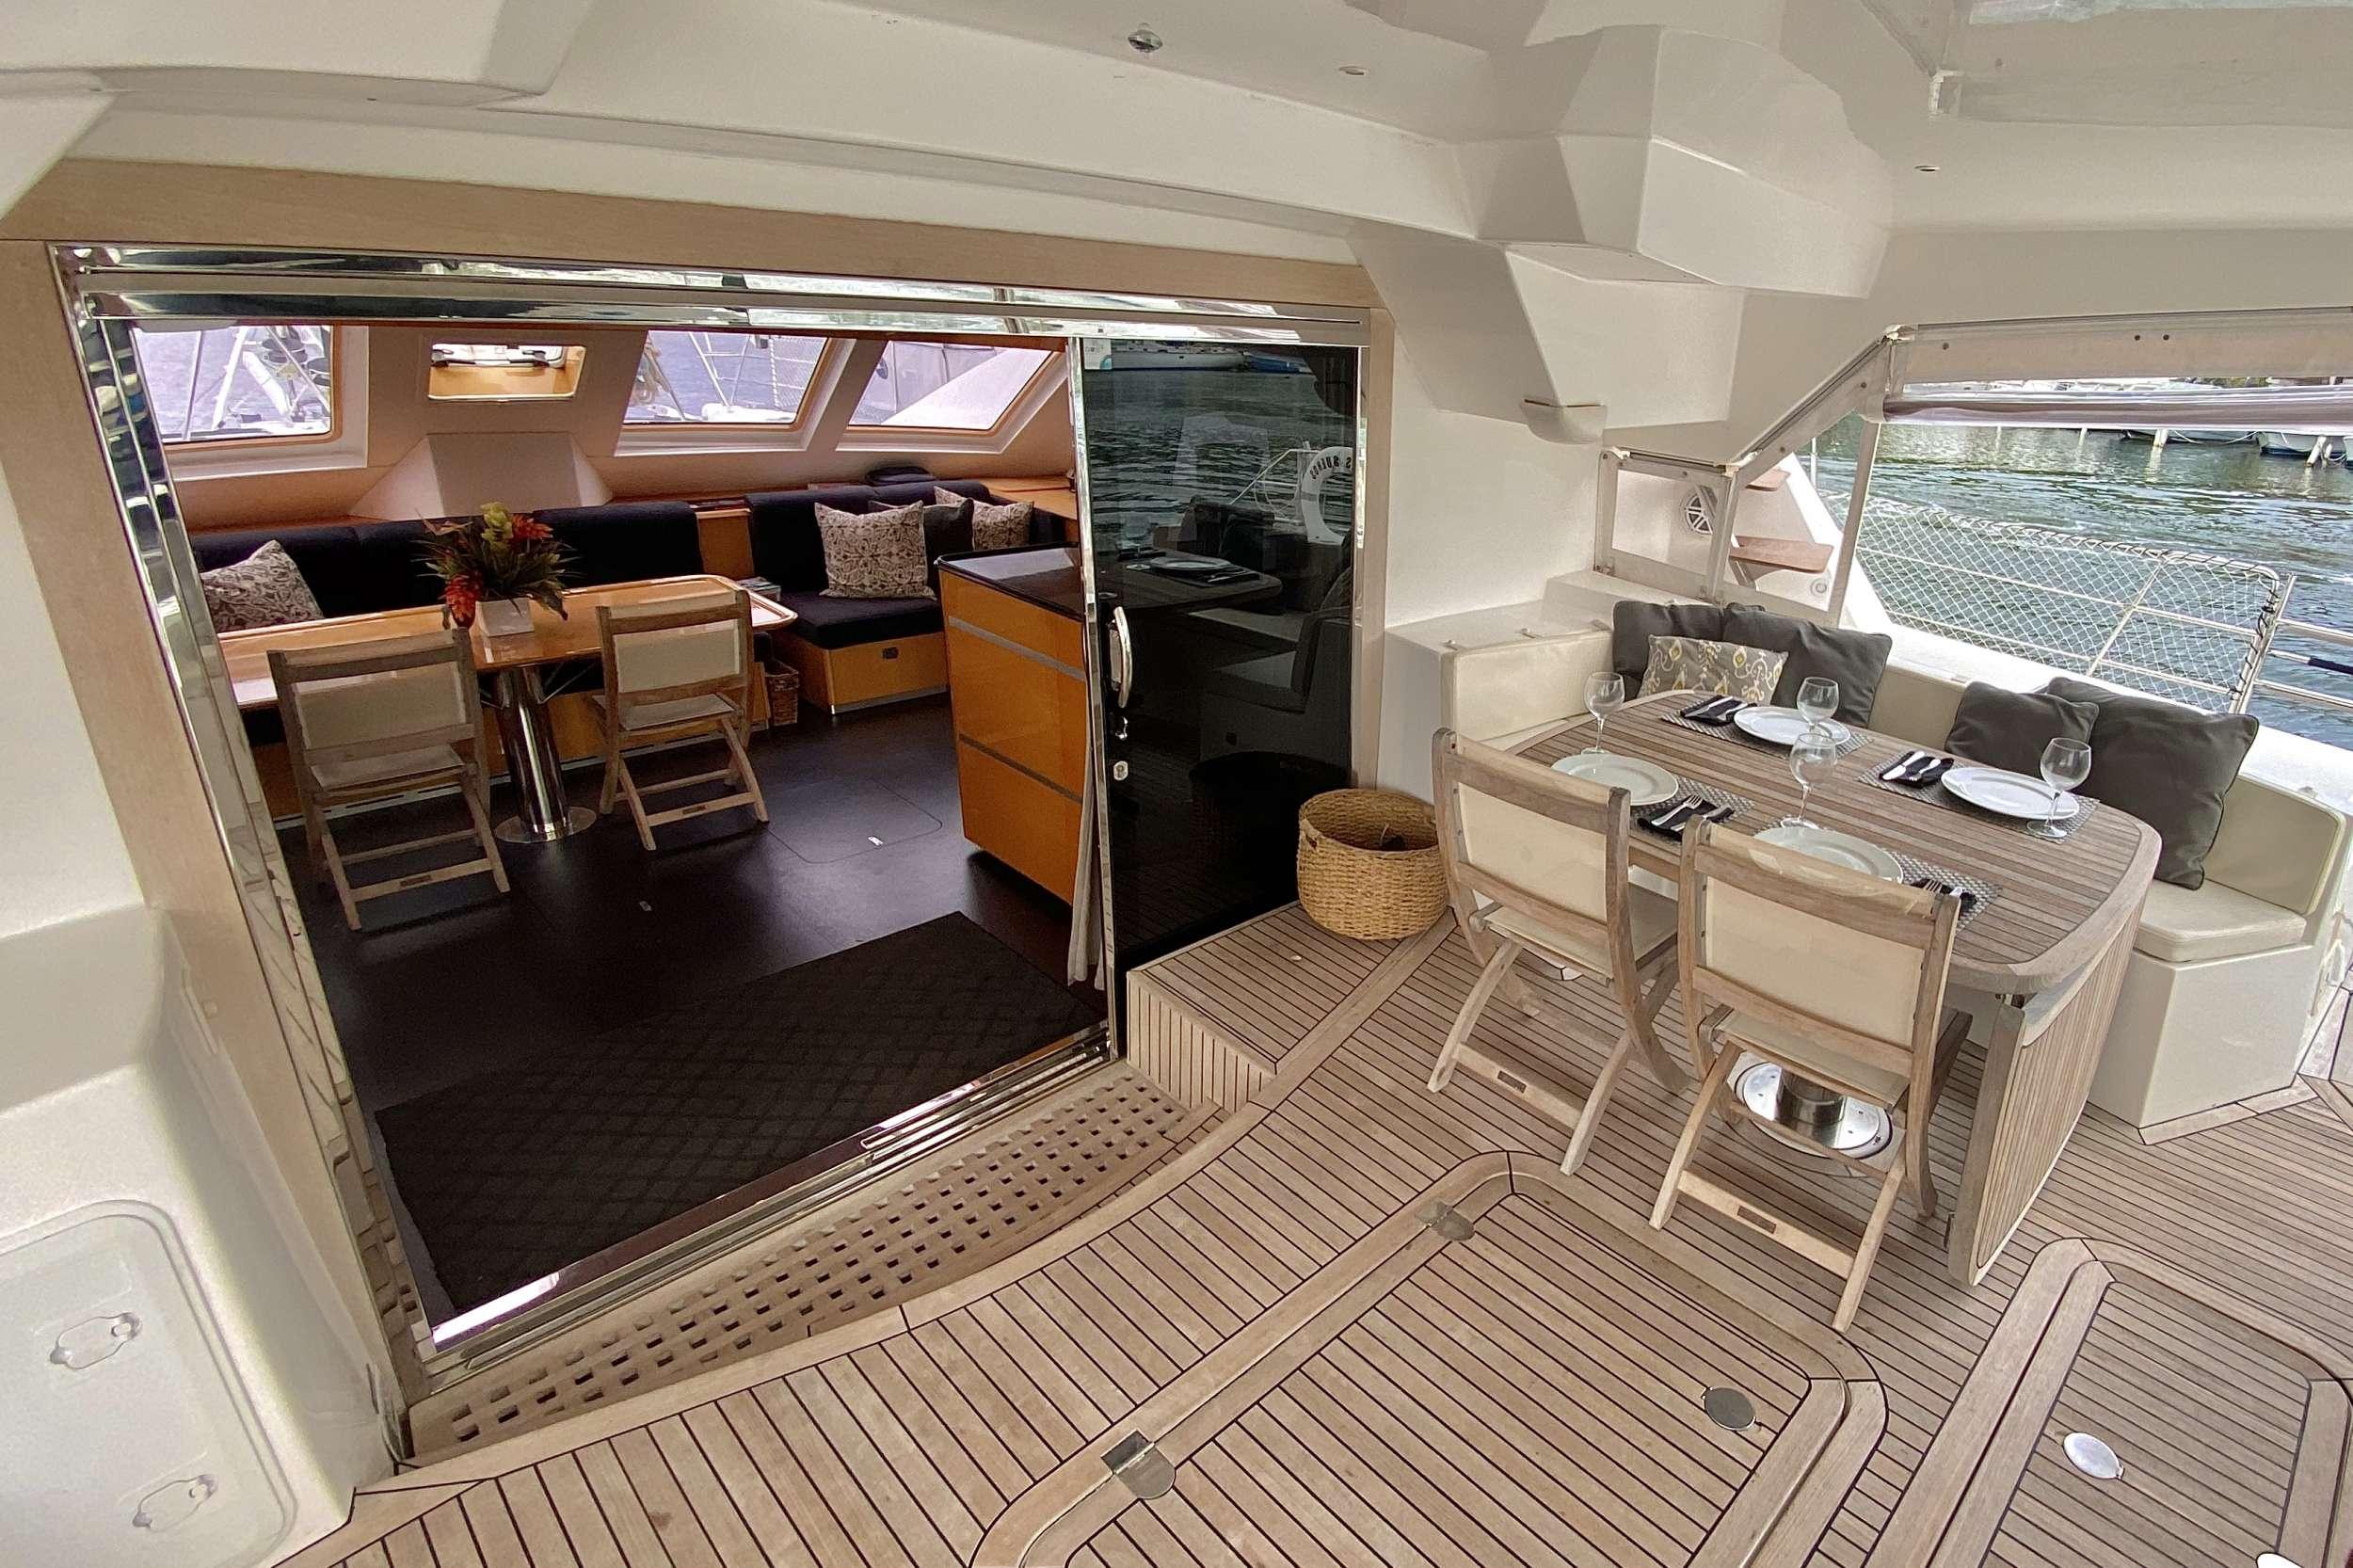 TRES SUENOS yacht image # 11